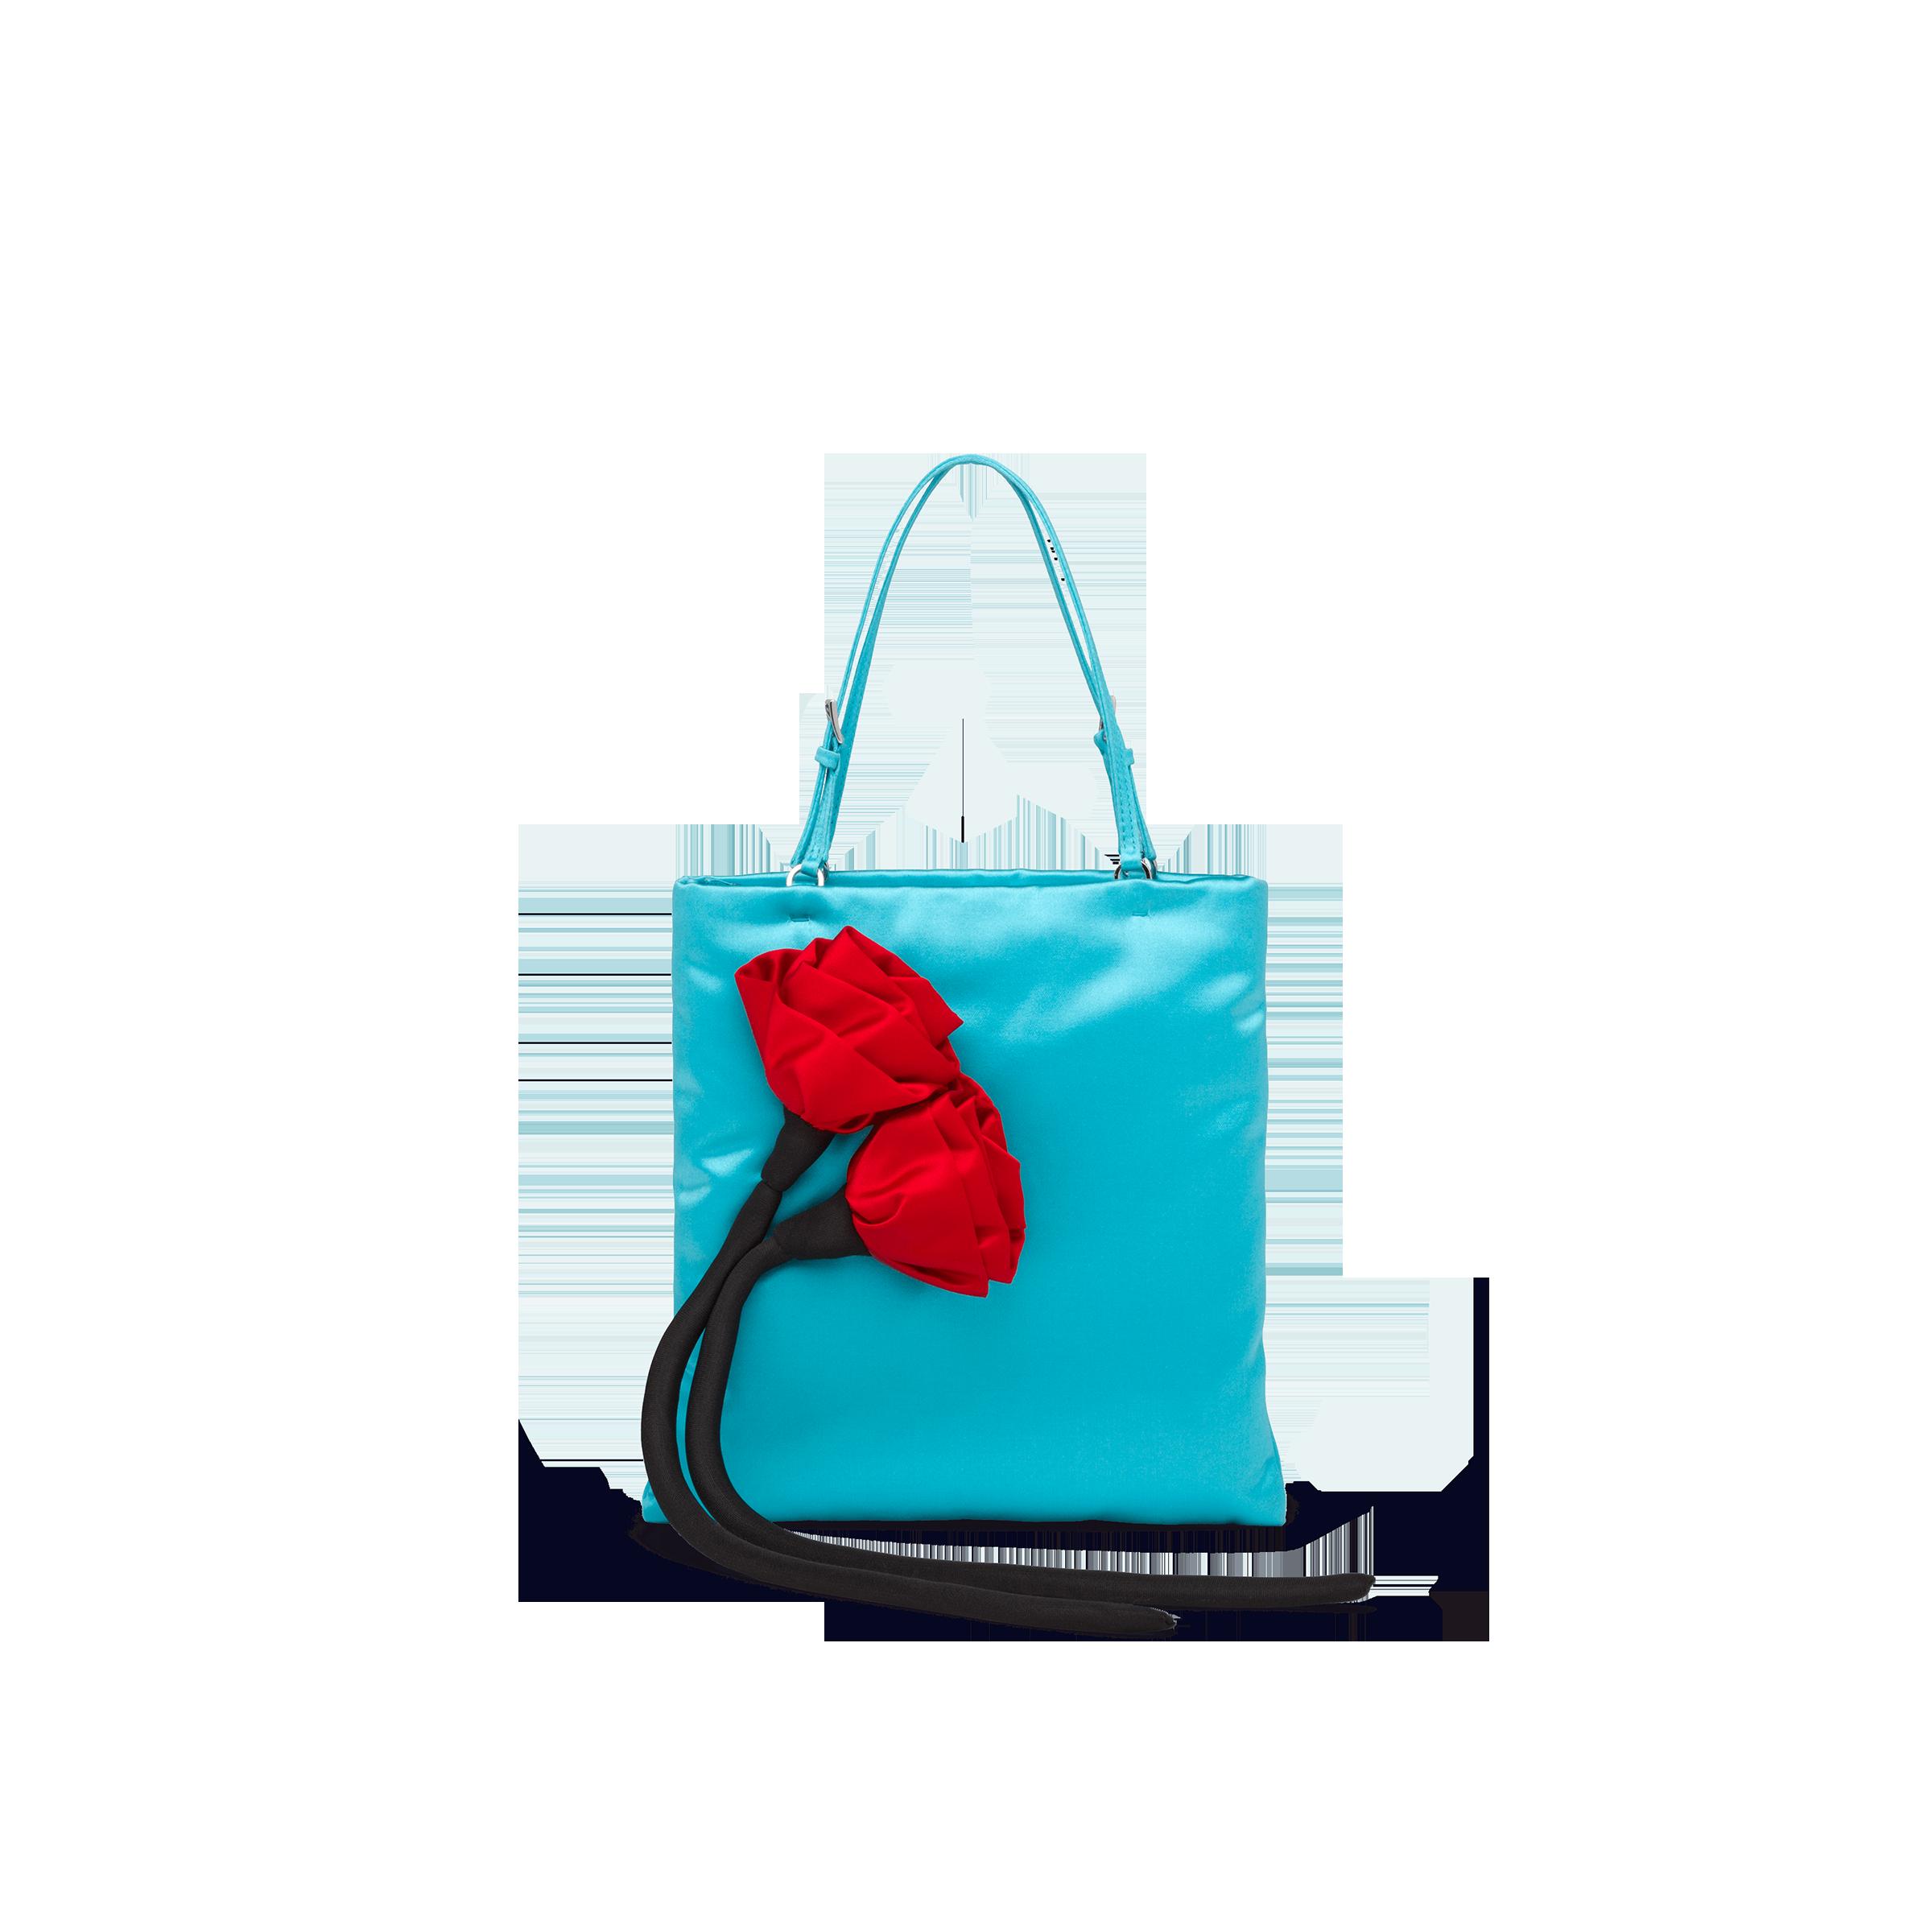 88336b72fc9 Prada Blossom handbag